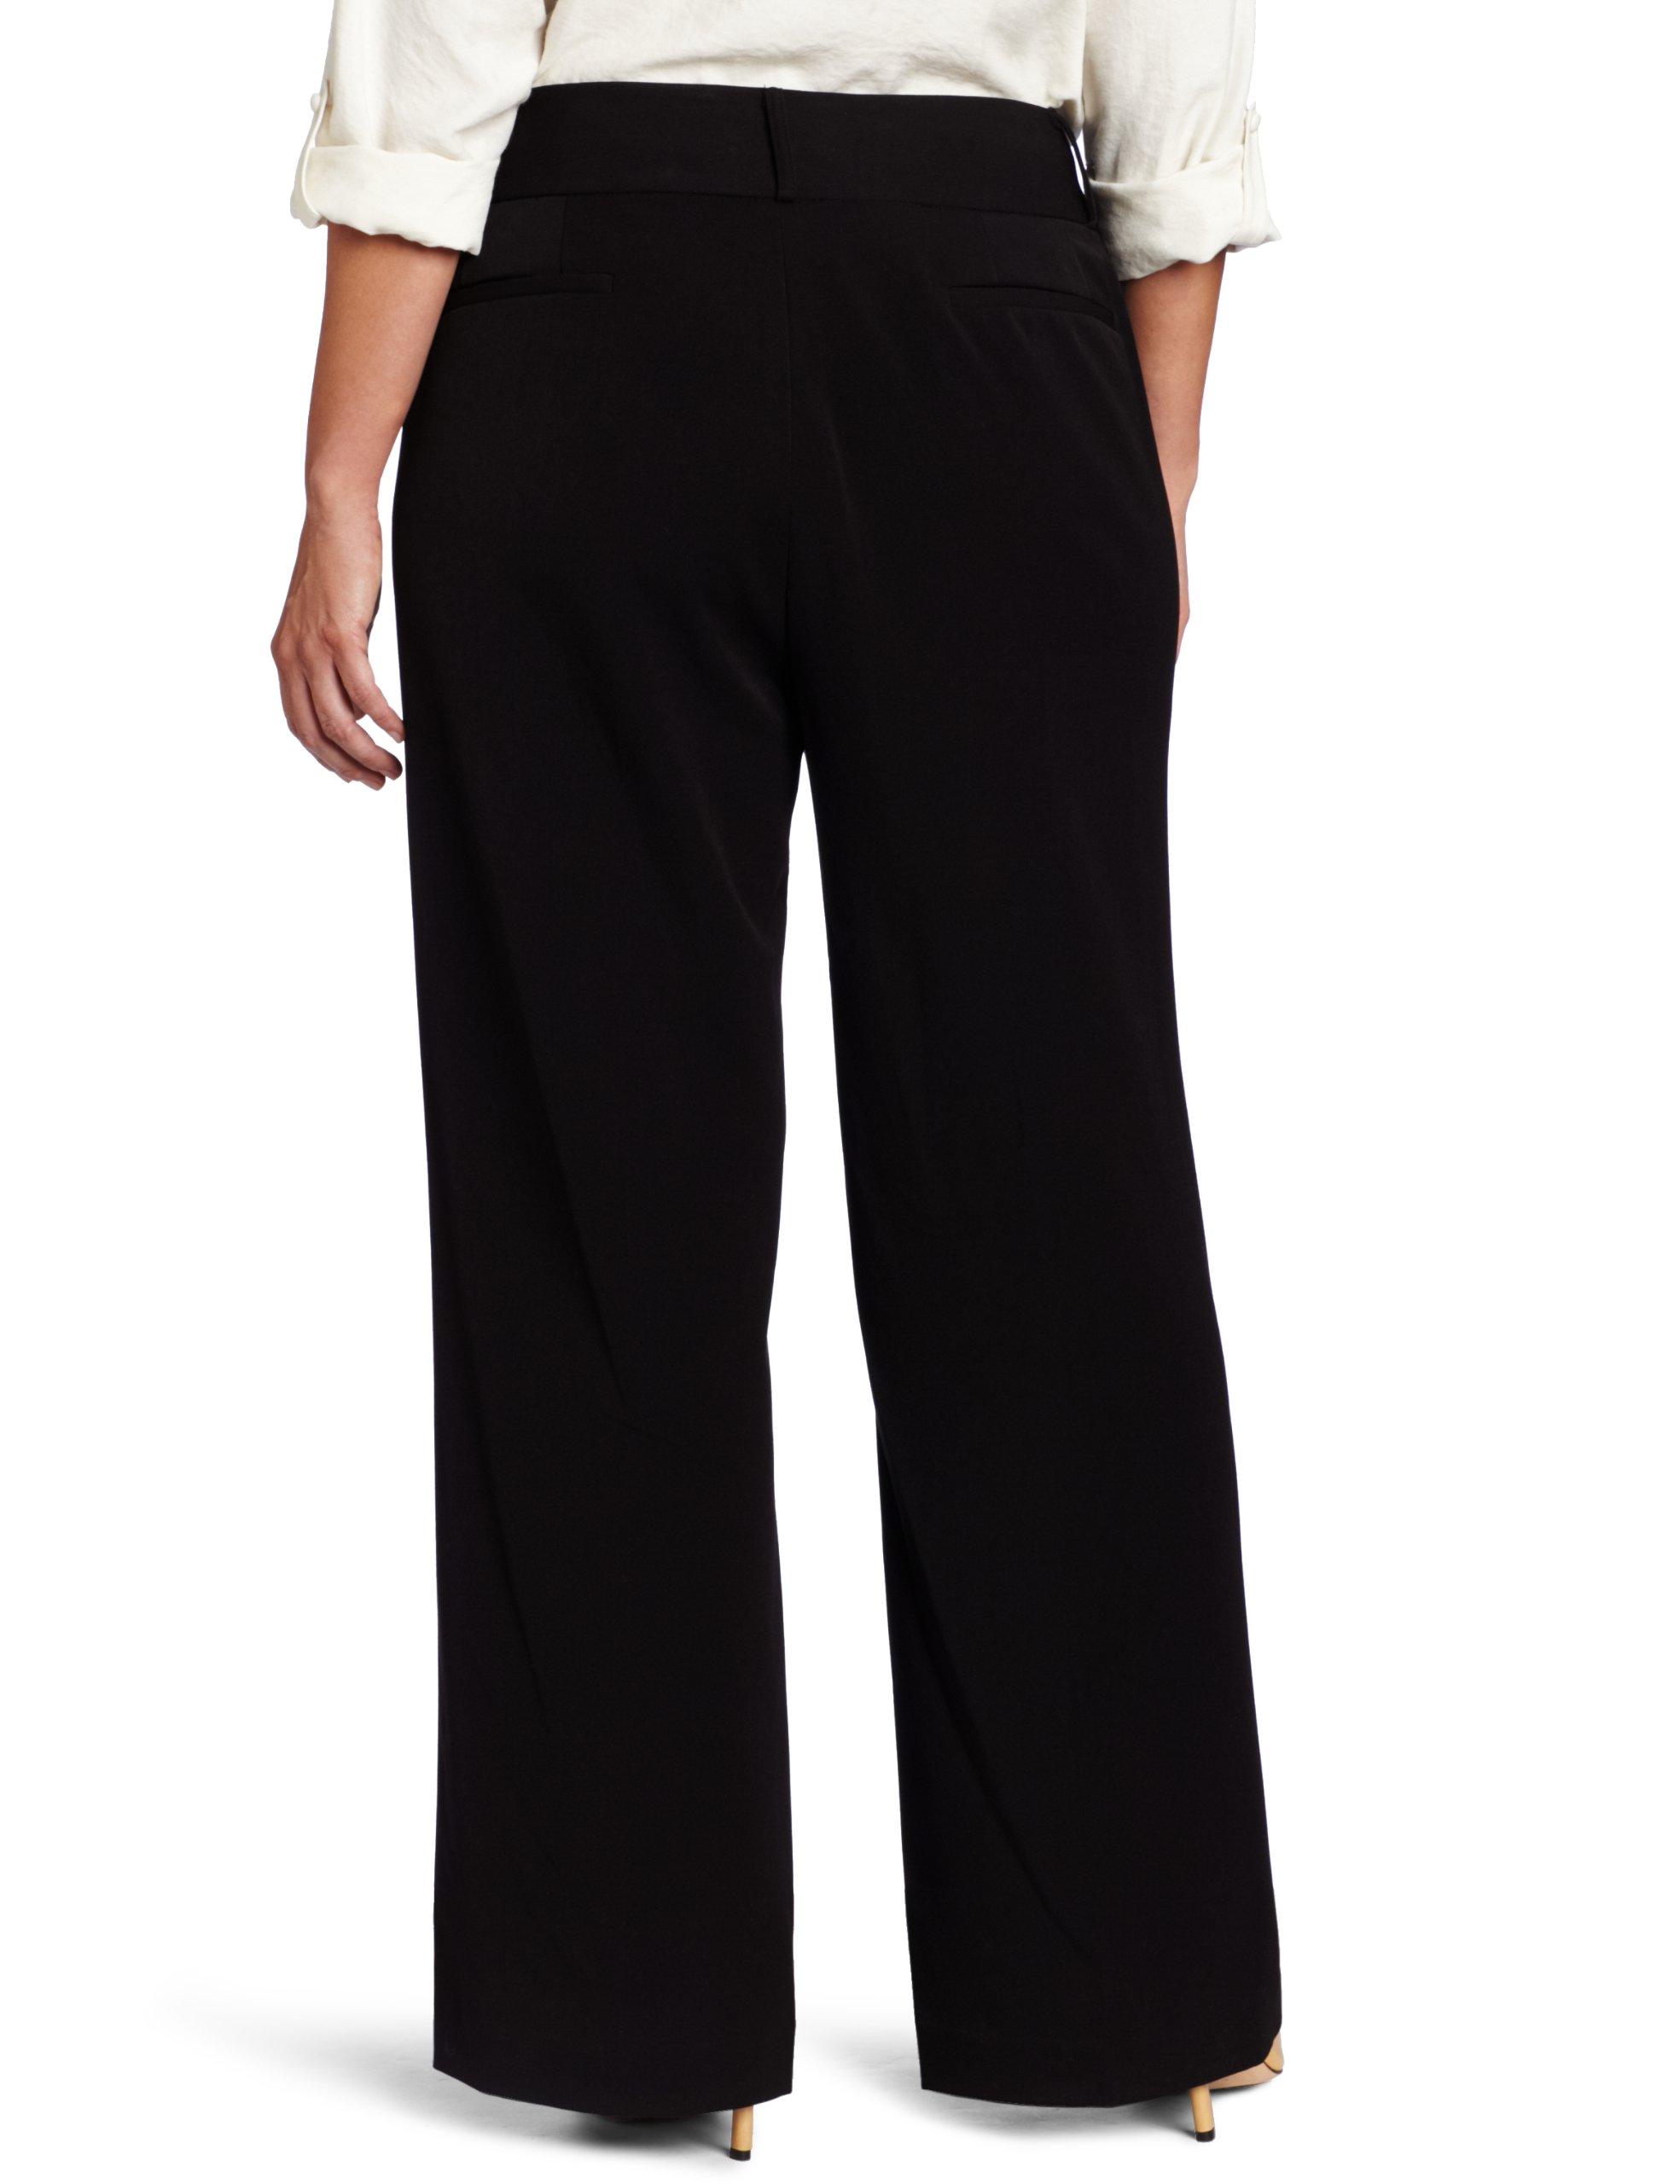 Rafaella Women's Plus-Size Curvy-Fit Gabardine Bootcut Trouser, Black, 20W by Rafaella (Image #2)